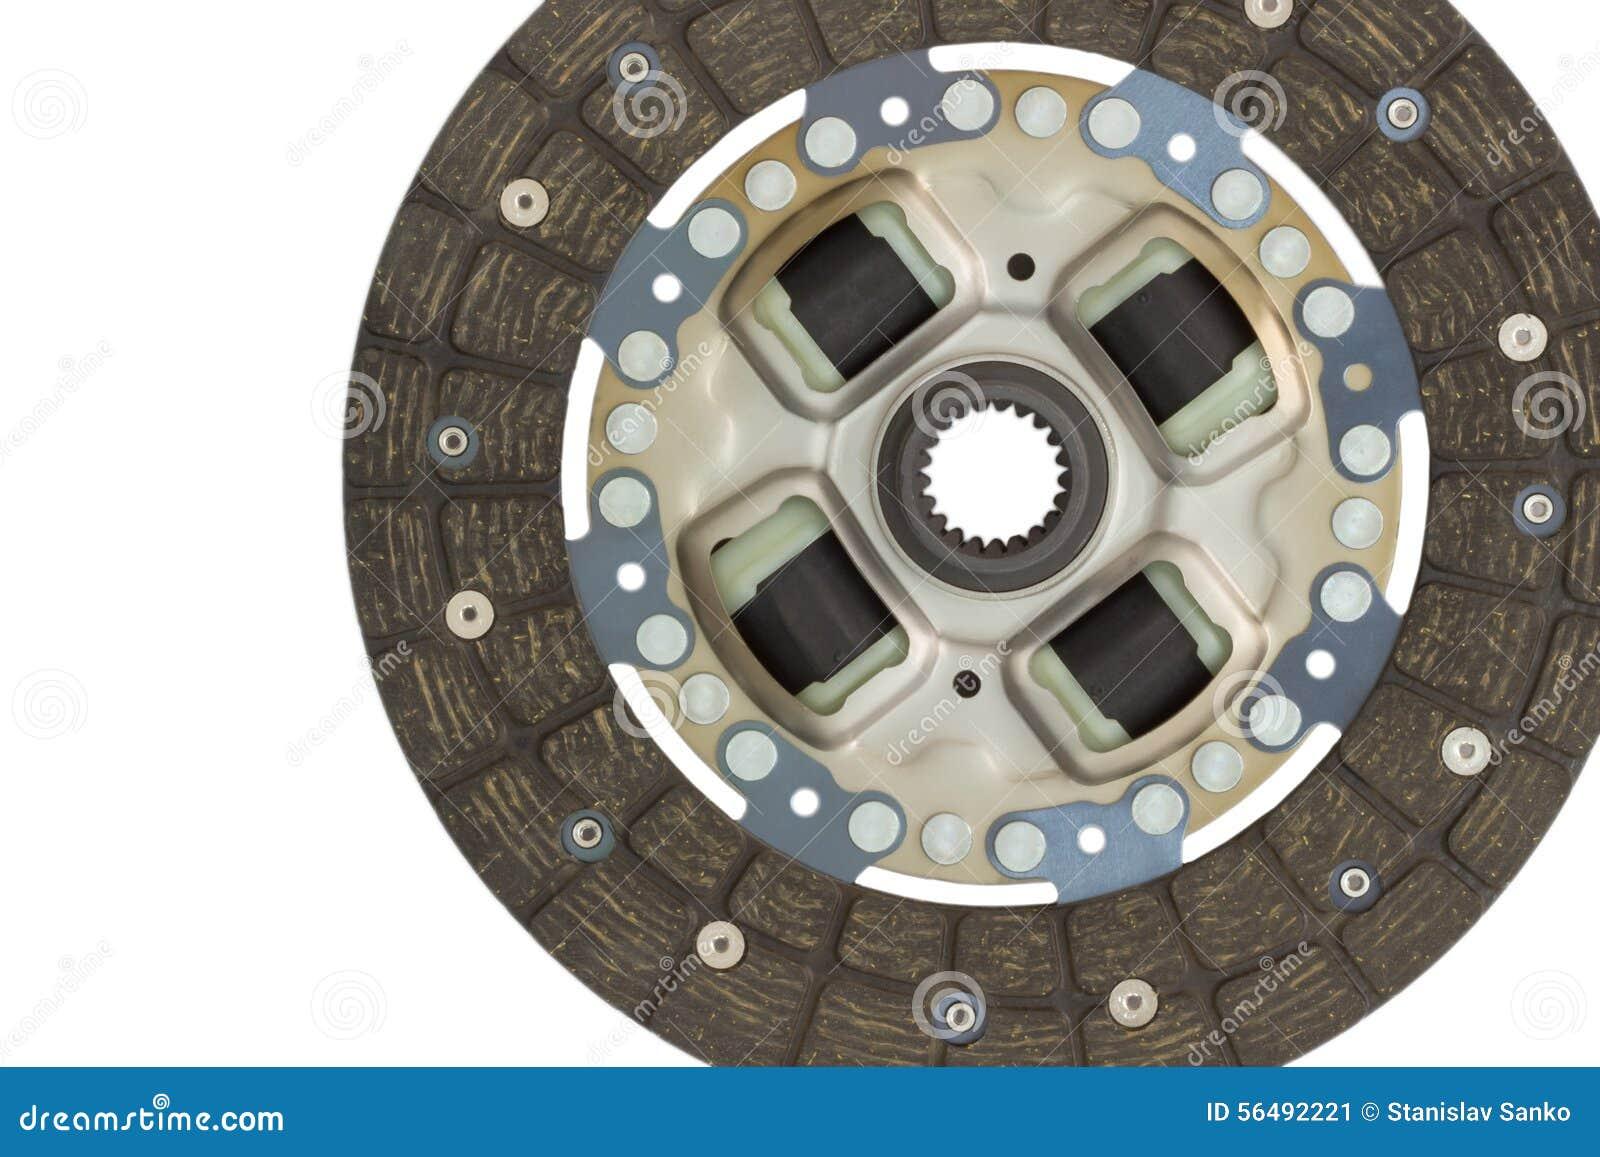 Car disc clutch on a white